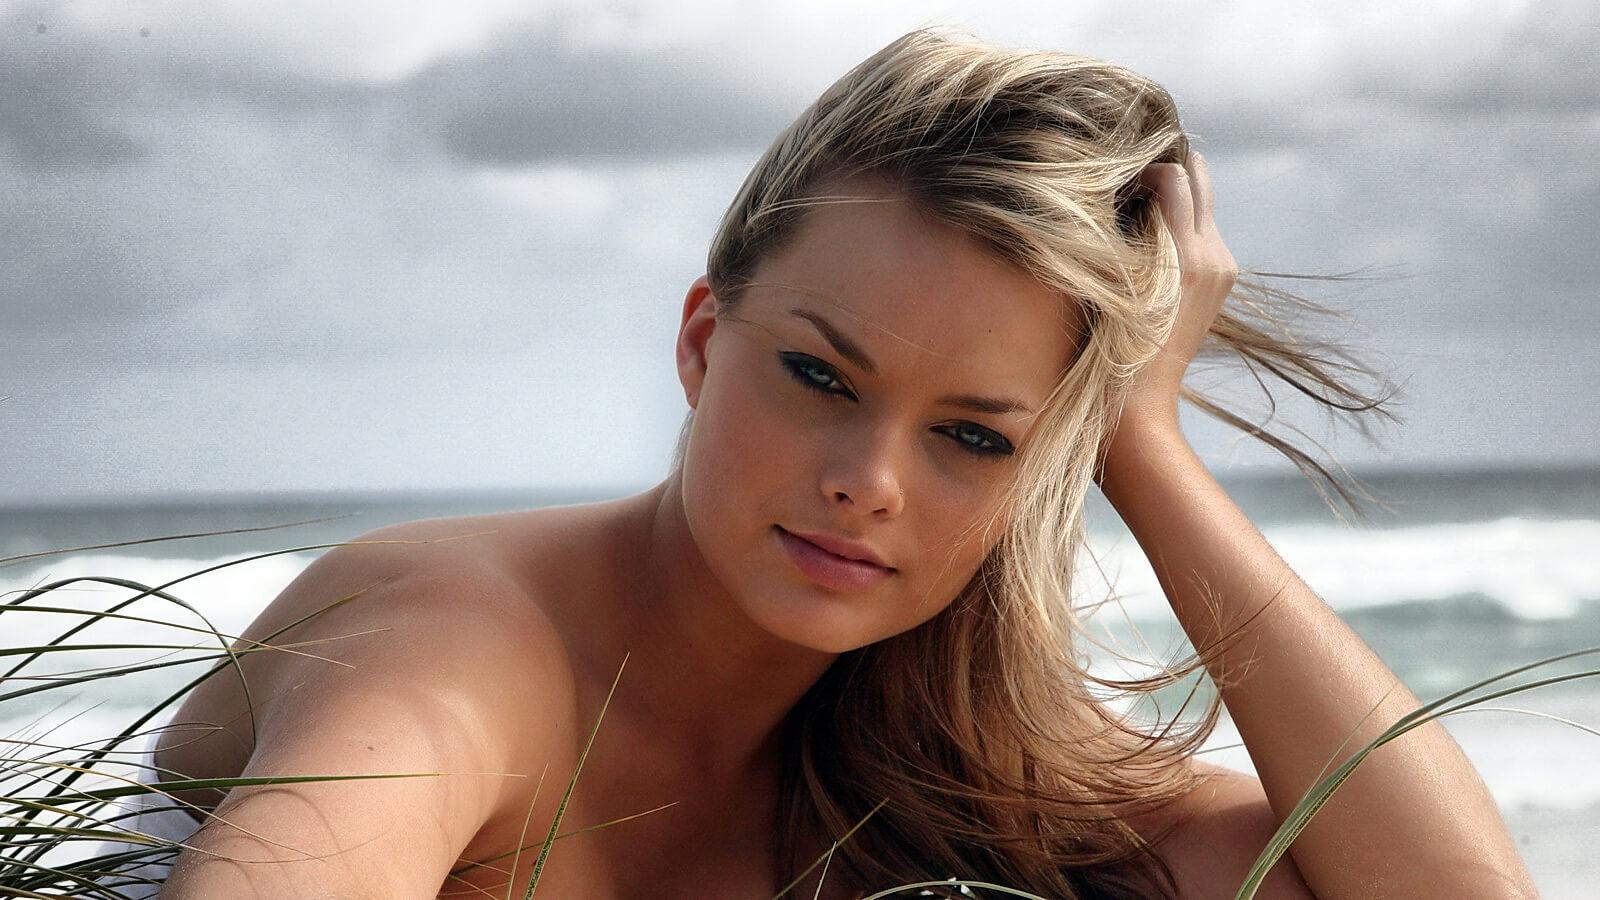 Lsa mujer mas linda foto desnuda